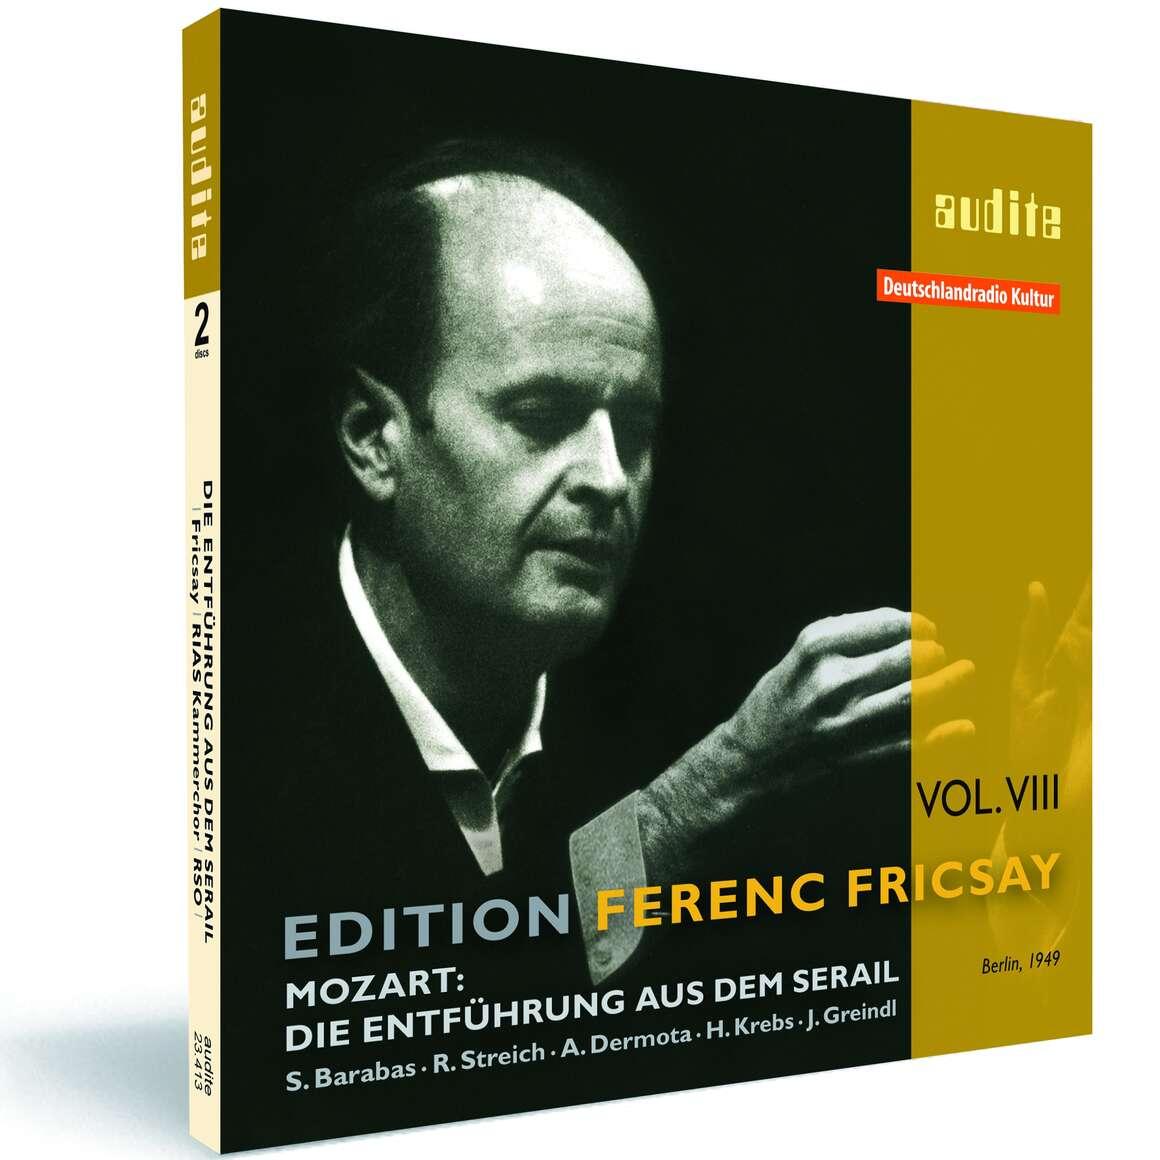 Edition Ferenc Fricsay (VIII) – W.A. Mozart: Die Entführung aus dem Serail